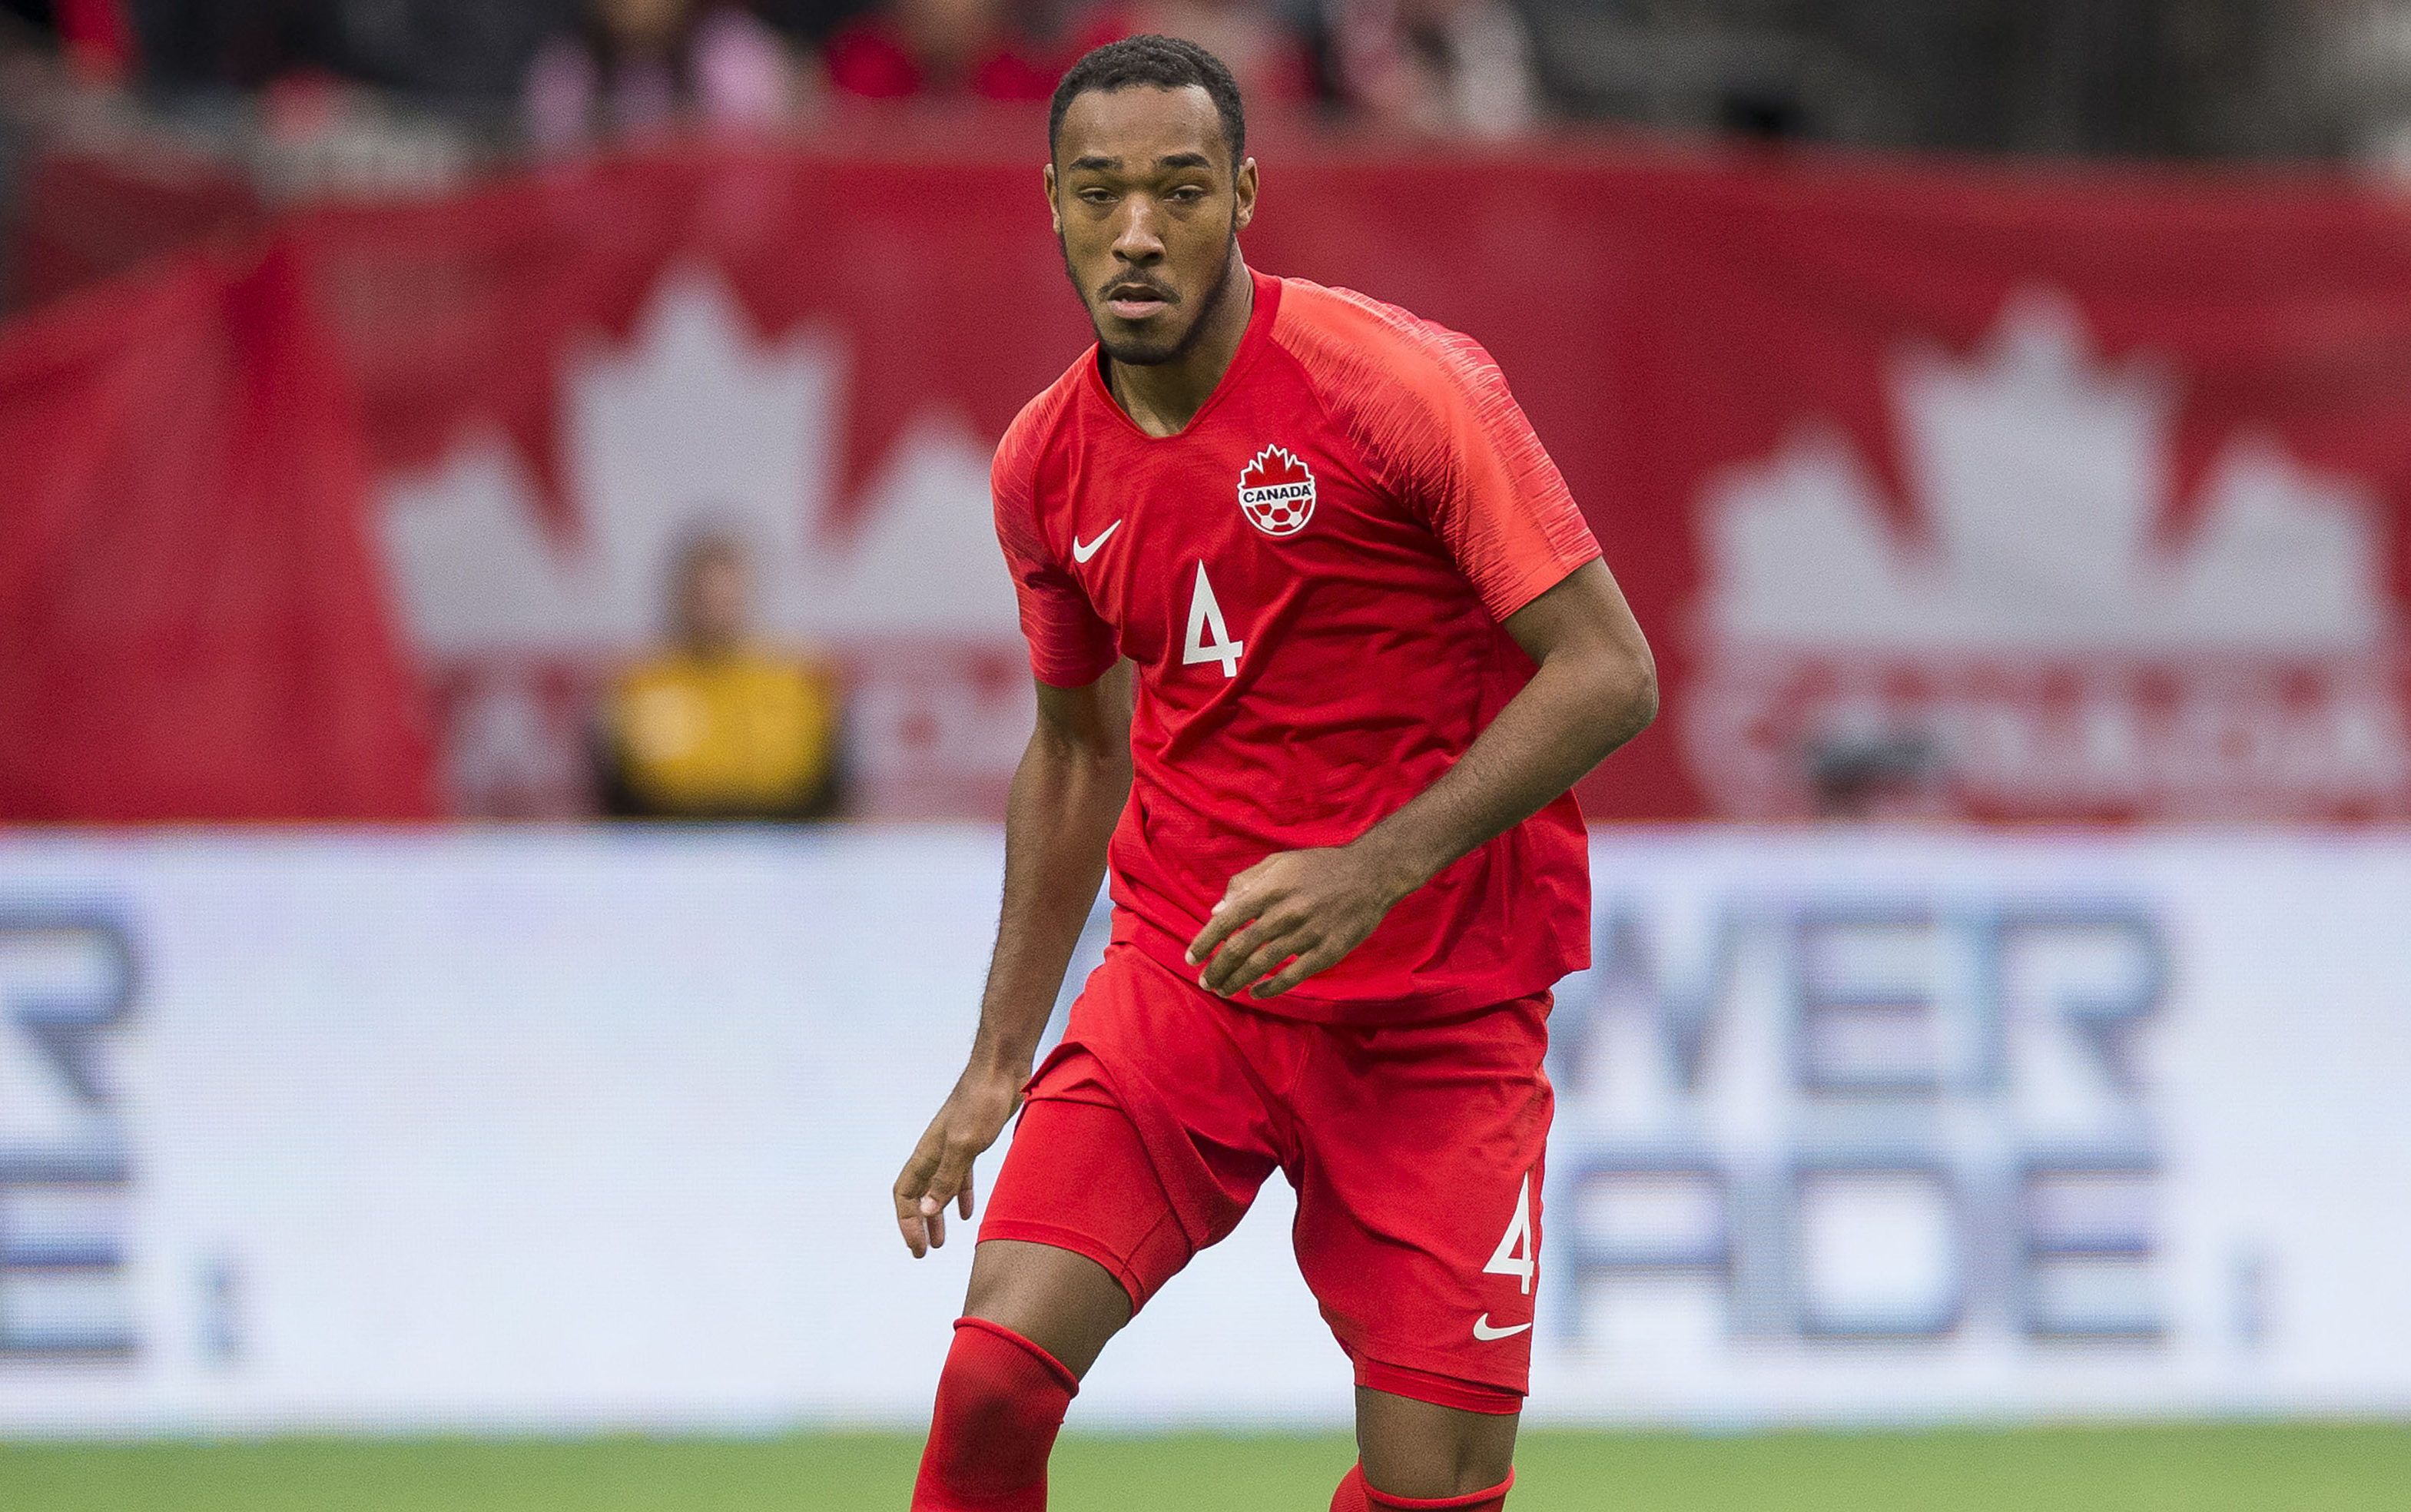 Canadian Men S Team Set To Kick Off Olympic Qualifying Journey Vs El Salvador Canadian Premier League